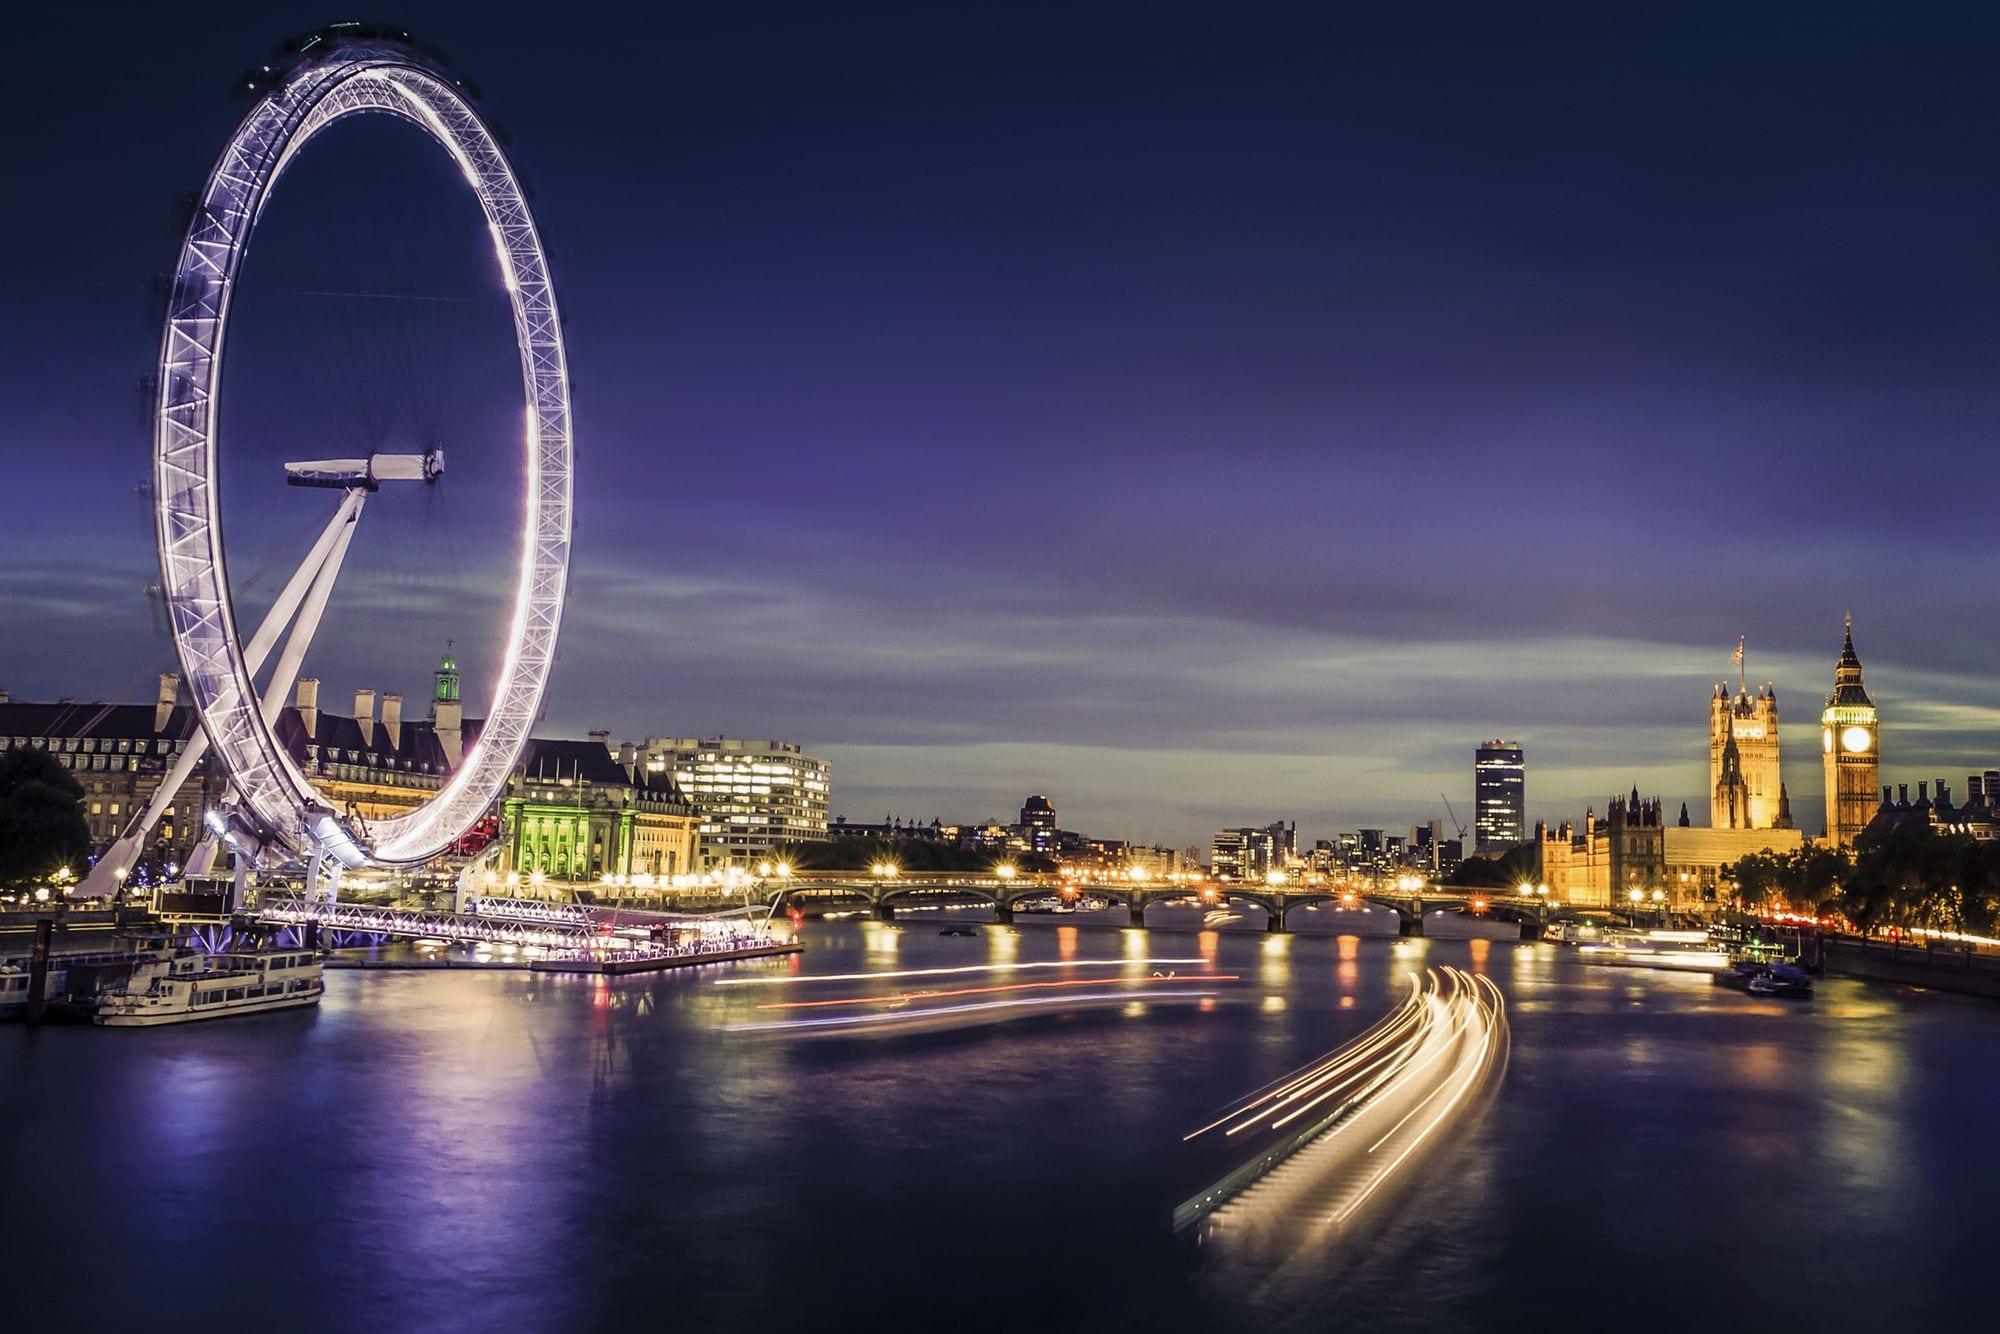 Hotels Near Big Ben, London - Top 10 Hotels by Big Ben